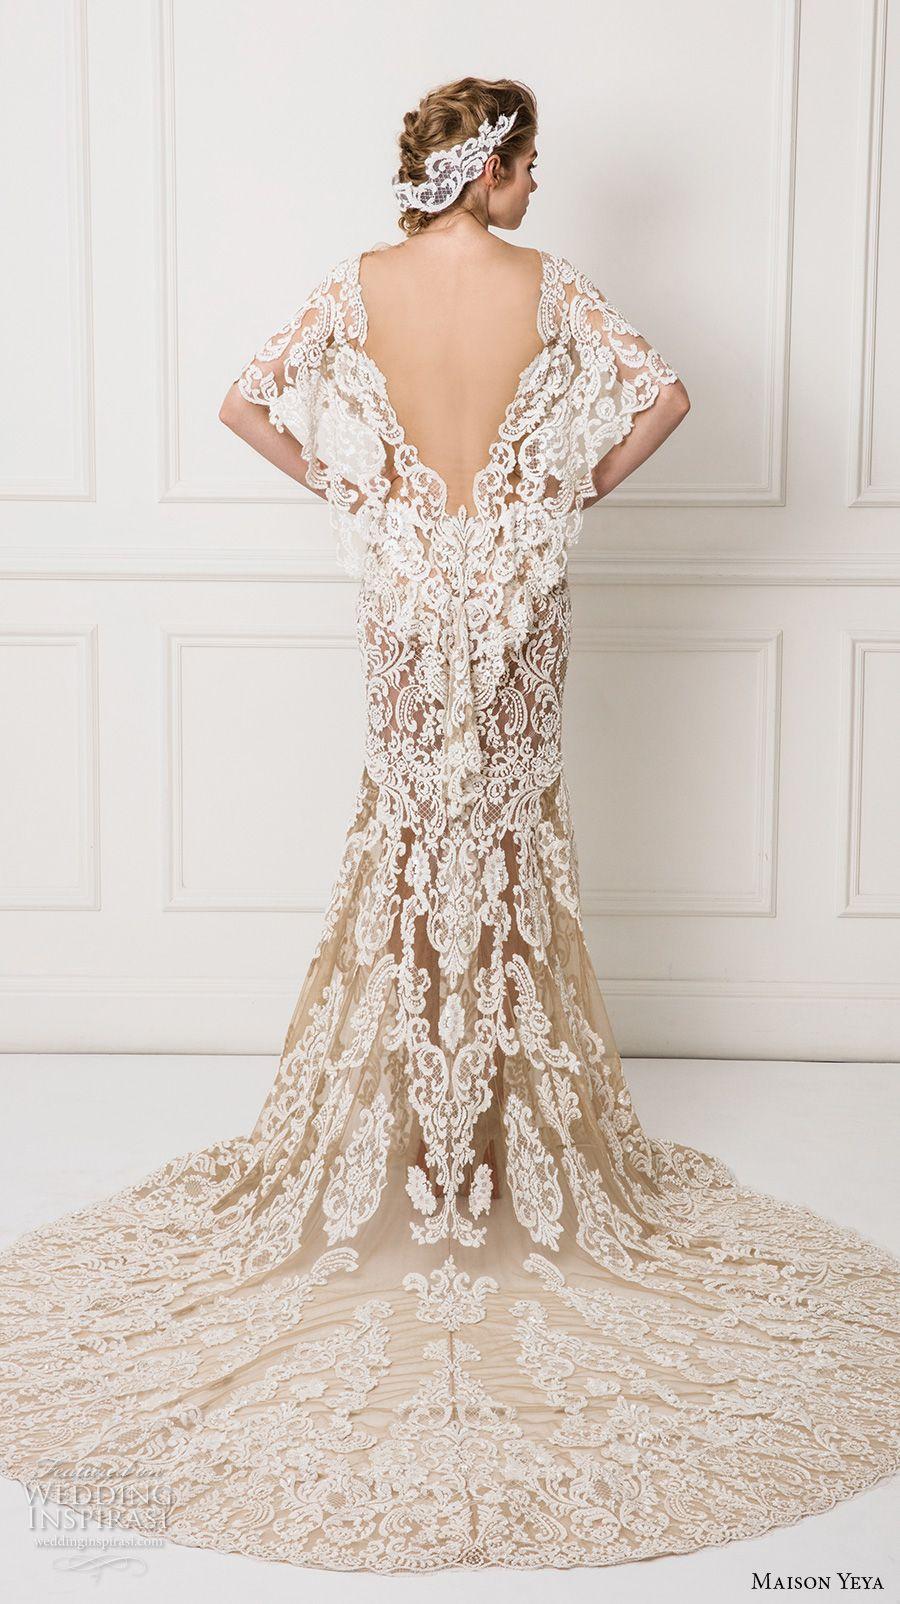 Maison yeya wedding dresses u ucles réfugiés duamourud bridal